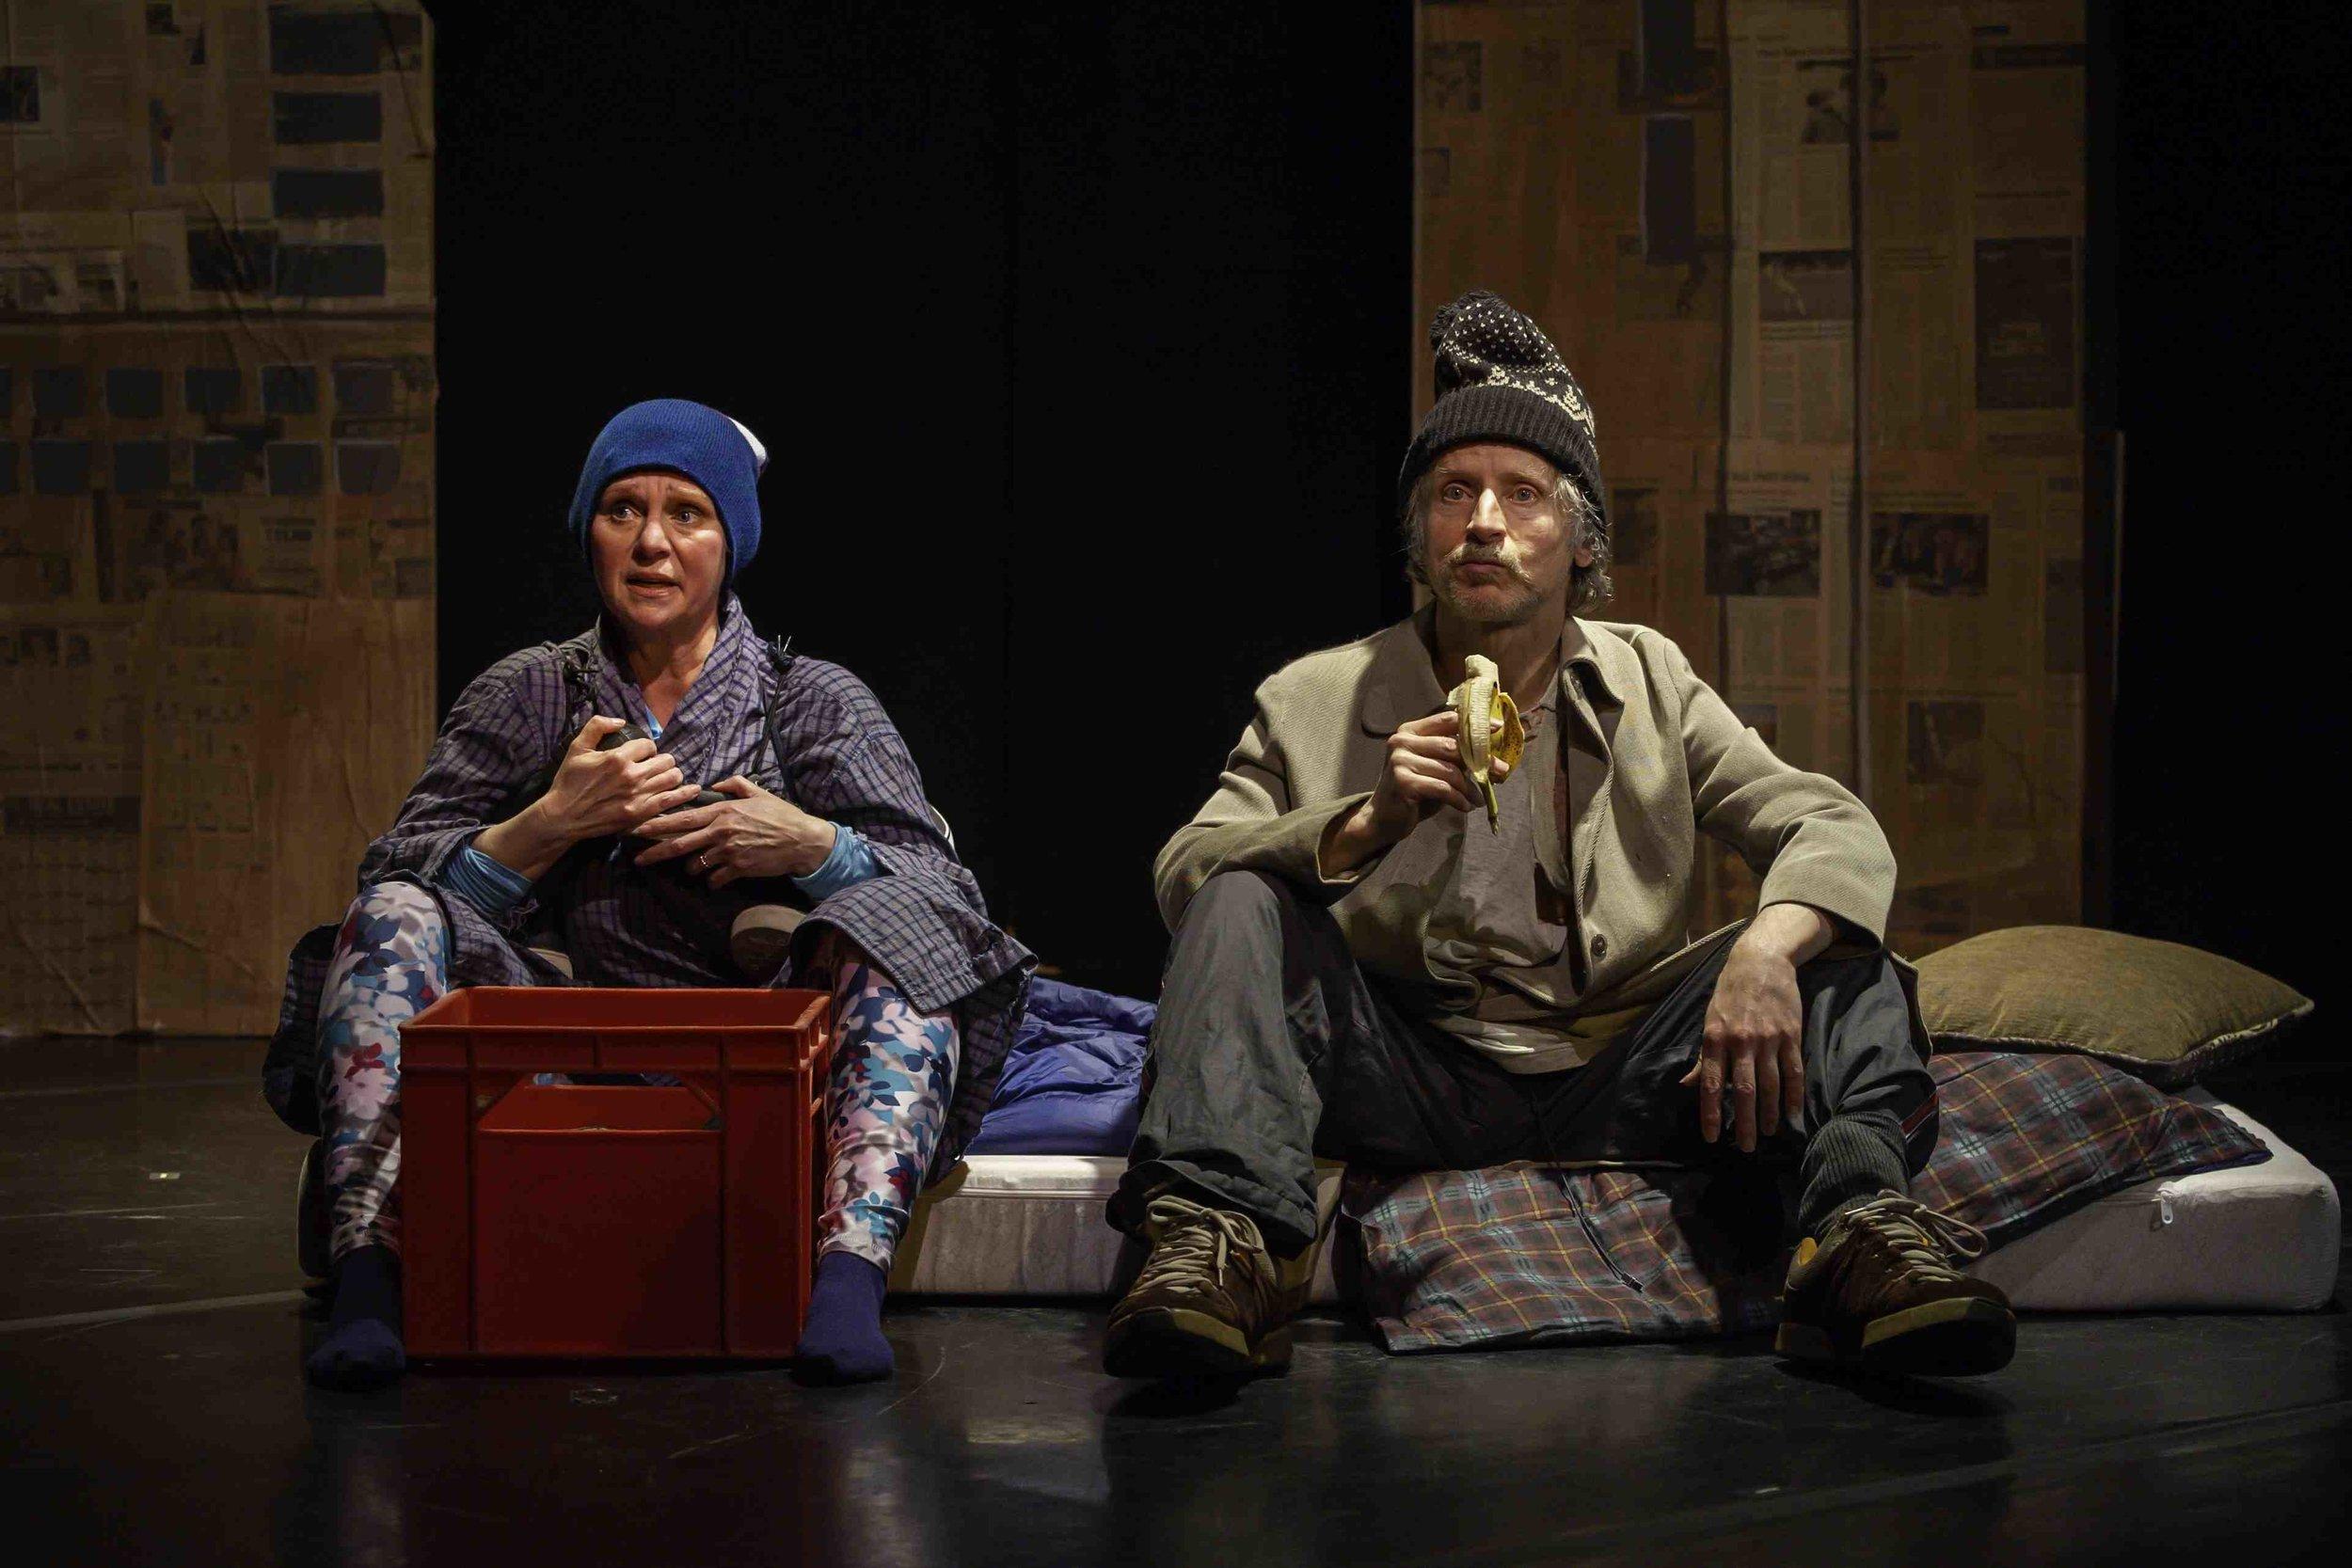 L to R: Deborah Drakeford as Gwen and Scott McCulloch as Kurt Vonnegut. Photo by John Gundy.